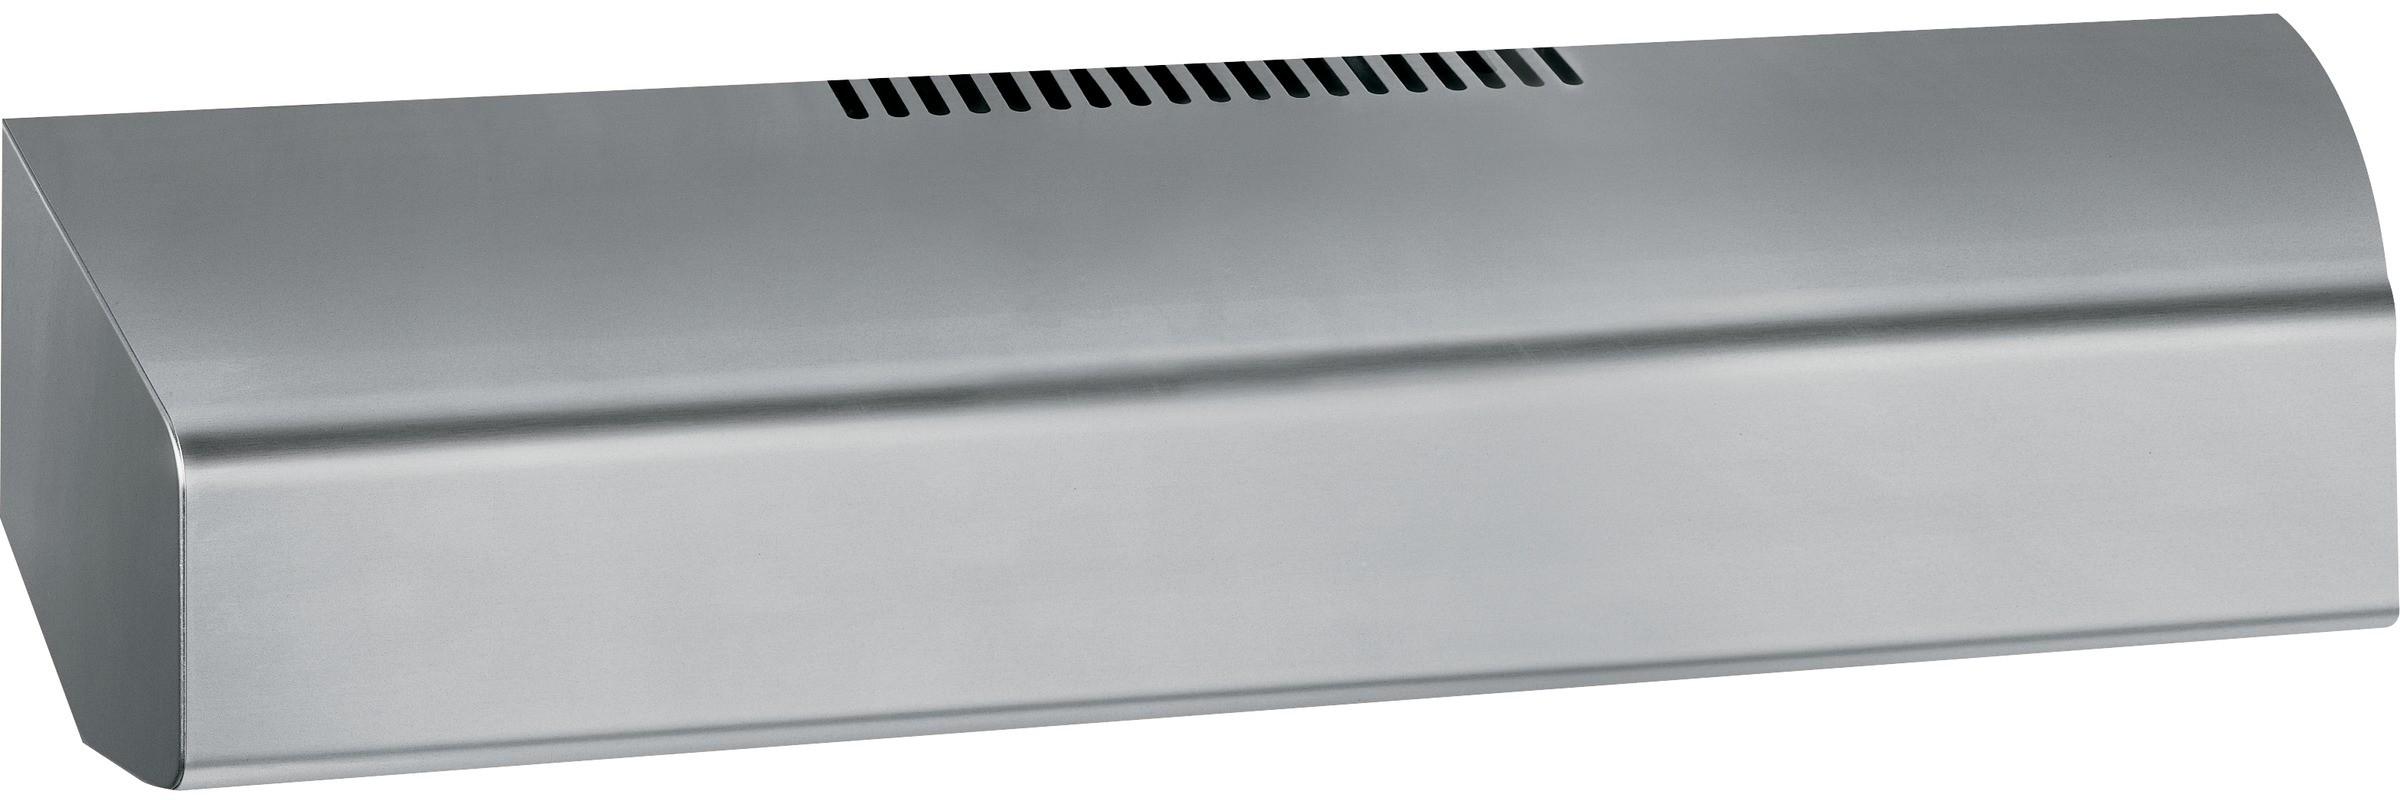 Ge Jv536hss 30 Inch Under Cabinet Range Hood With Up To 250 Cfm